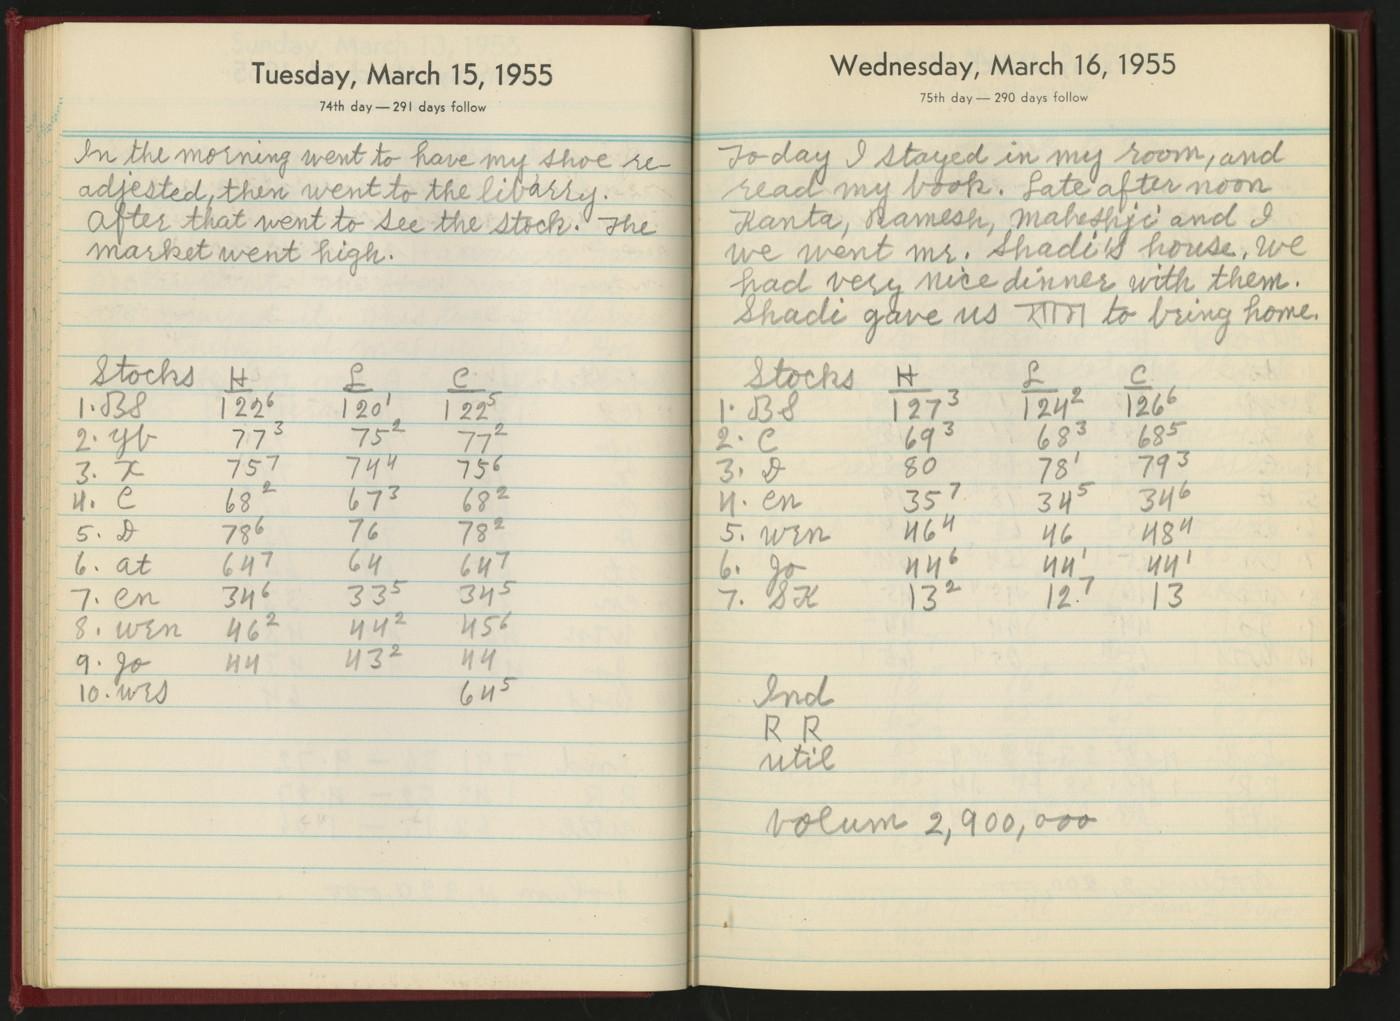 kala b chandra s personal diary south asian american digital